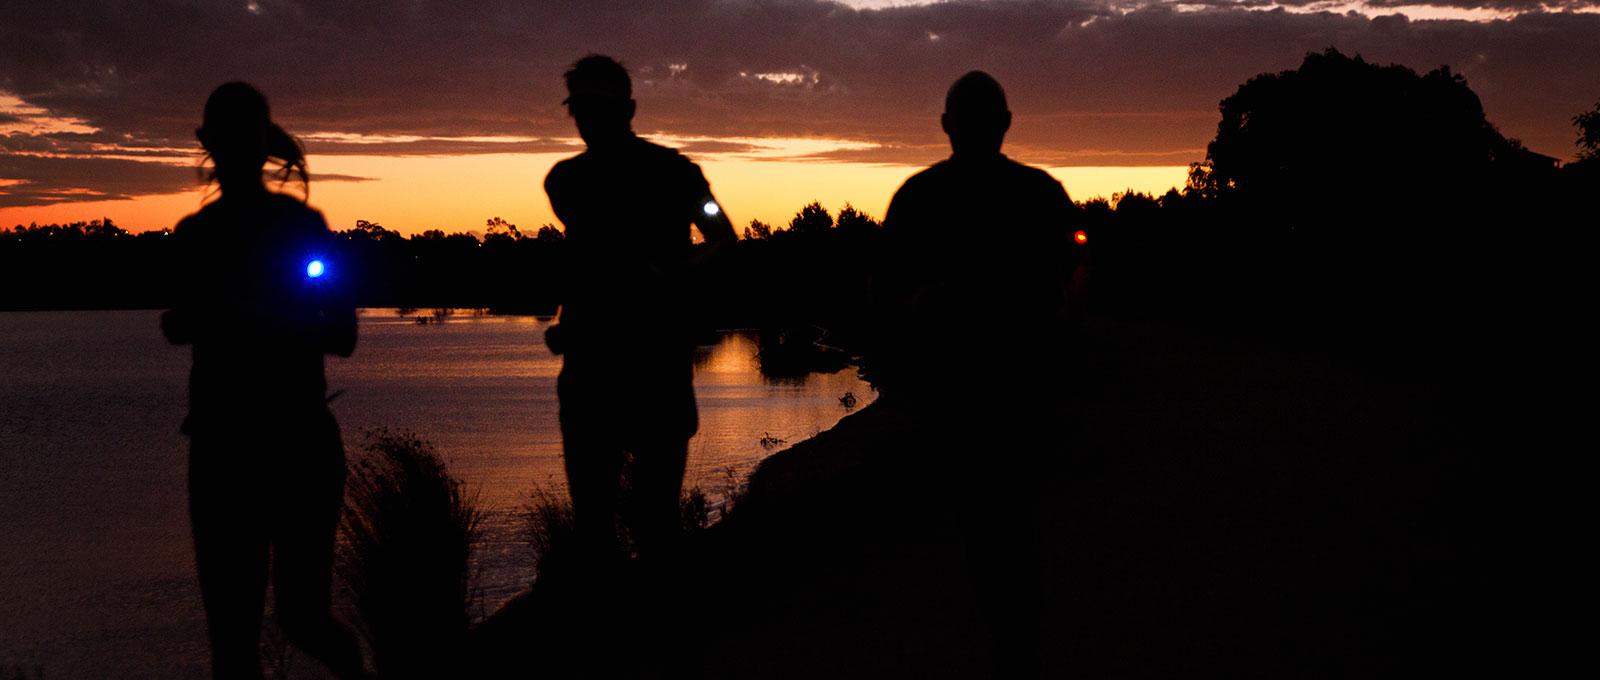 Orbiloc Run Dual Safety Light - Group Run Night